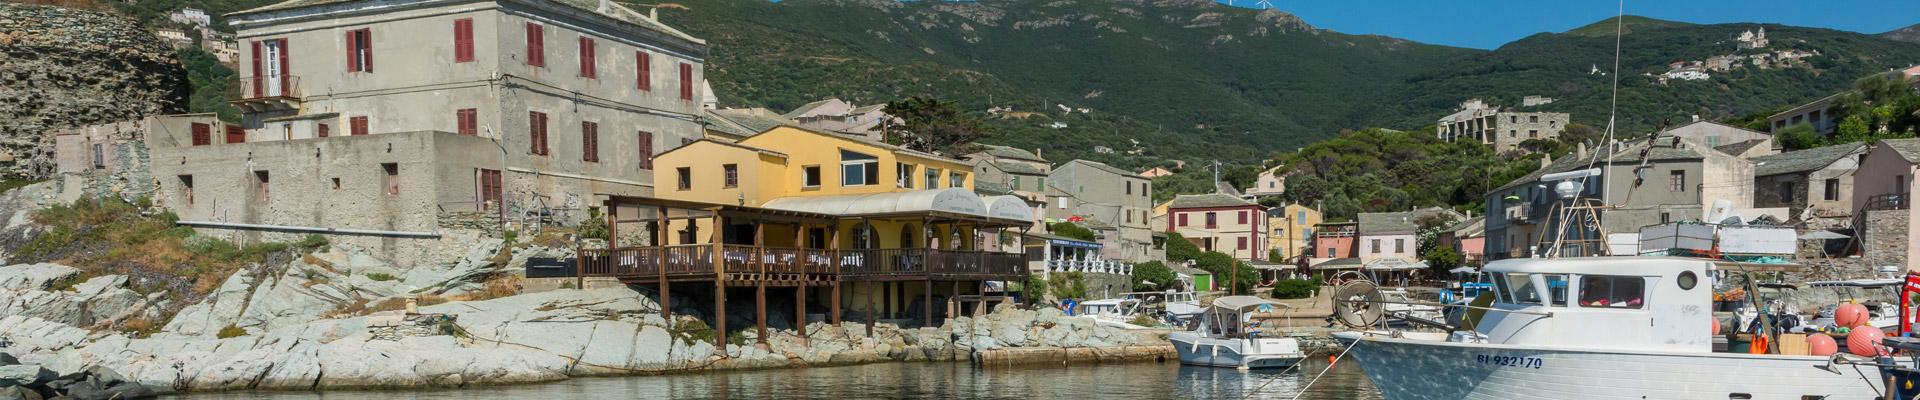 Slider Camping Korsika Sehenswürdigkeiten